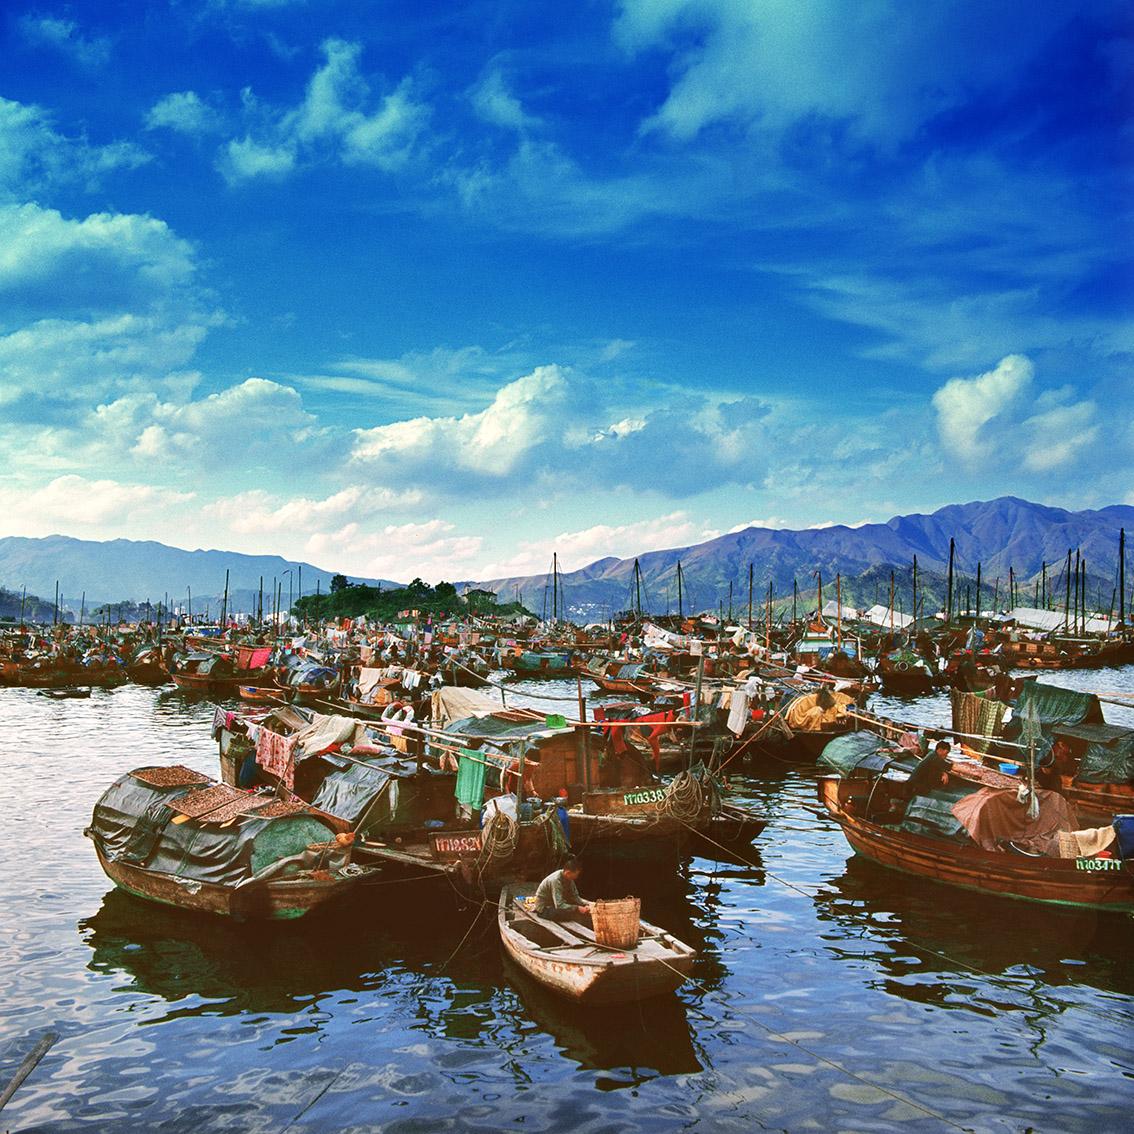 Tai Po Kau Boat People